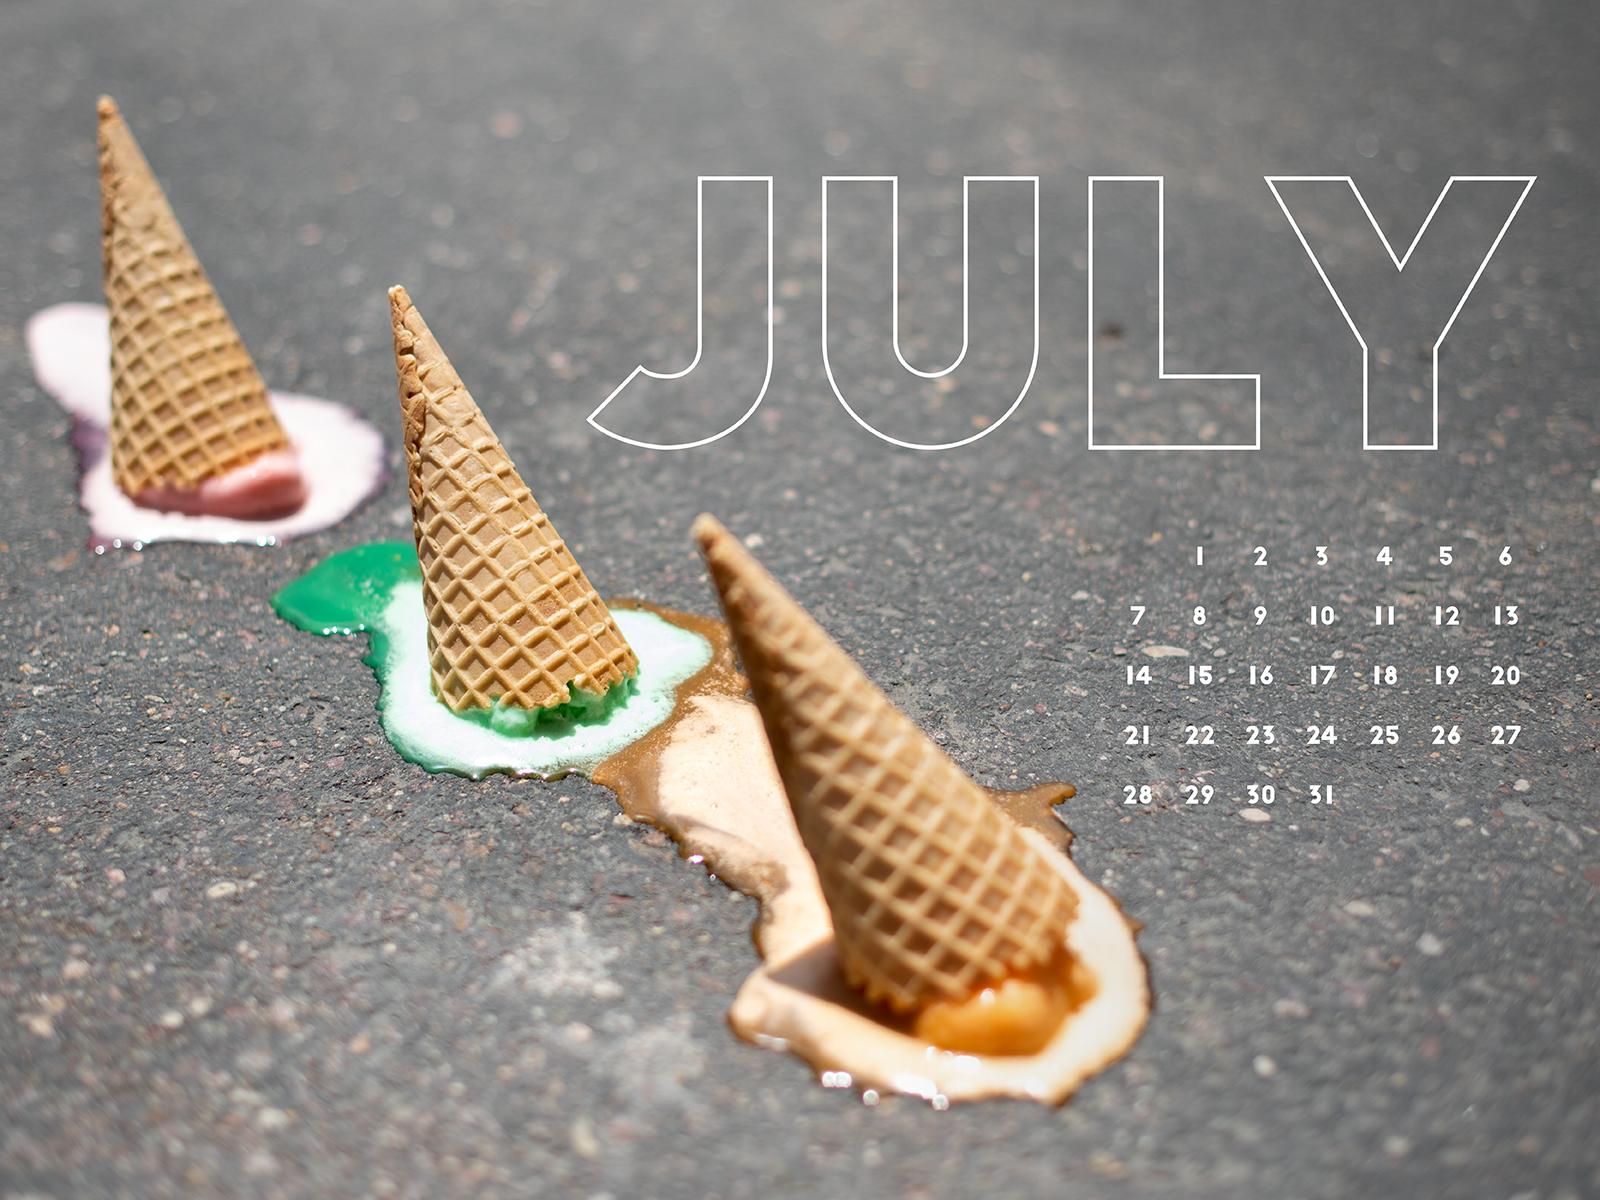 02 July Desktop Calendar - TSH_1600x1200.png